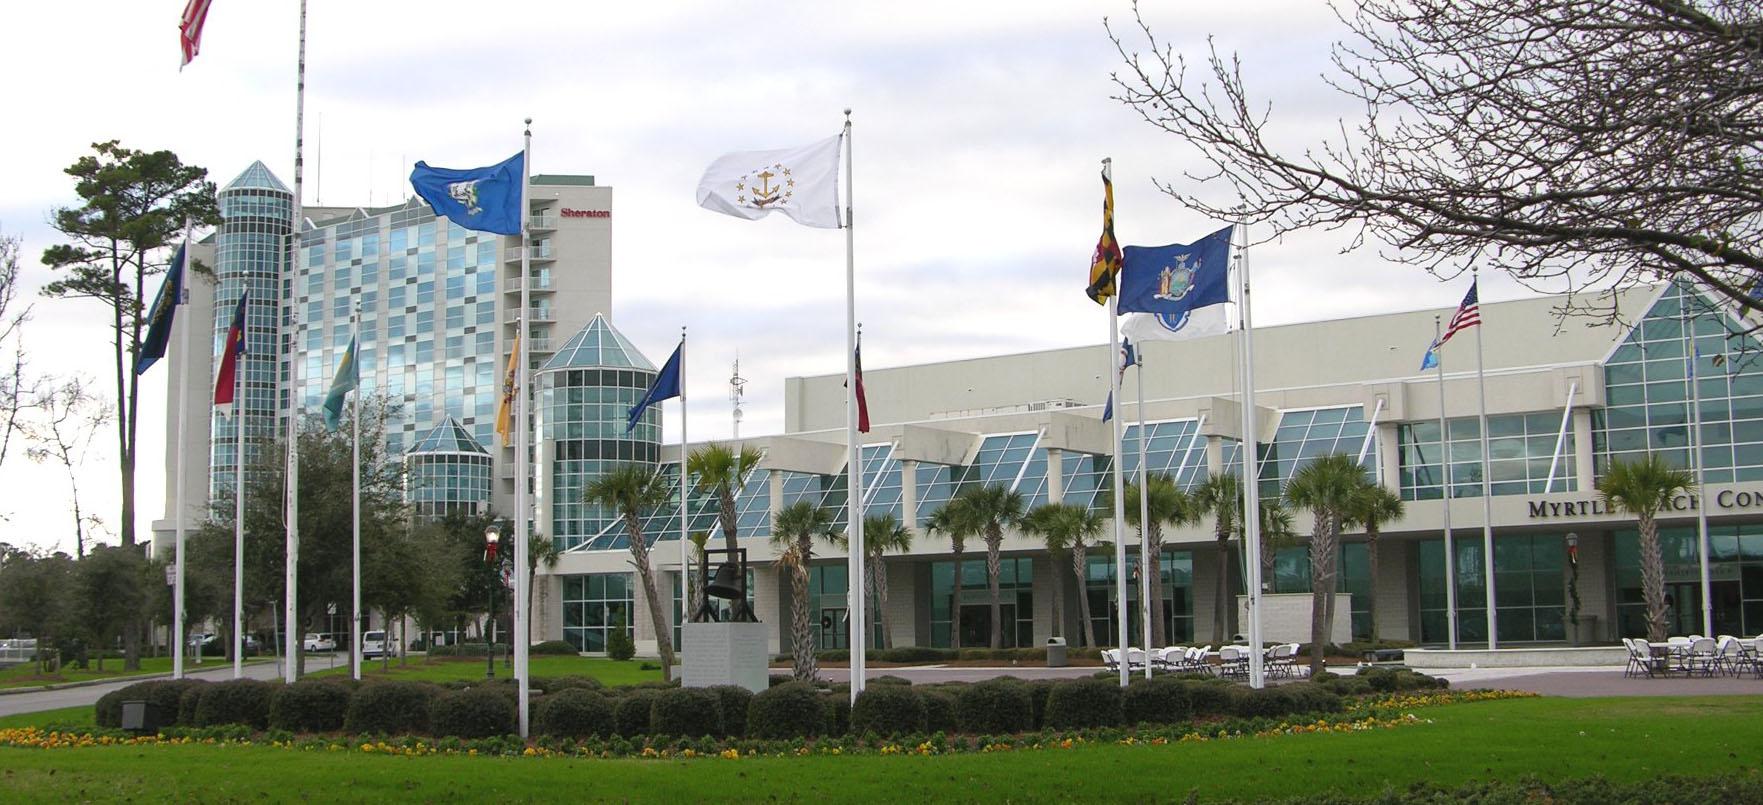 Myrtle Beach Convention Center Hosts The Gymastics Cup